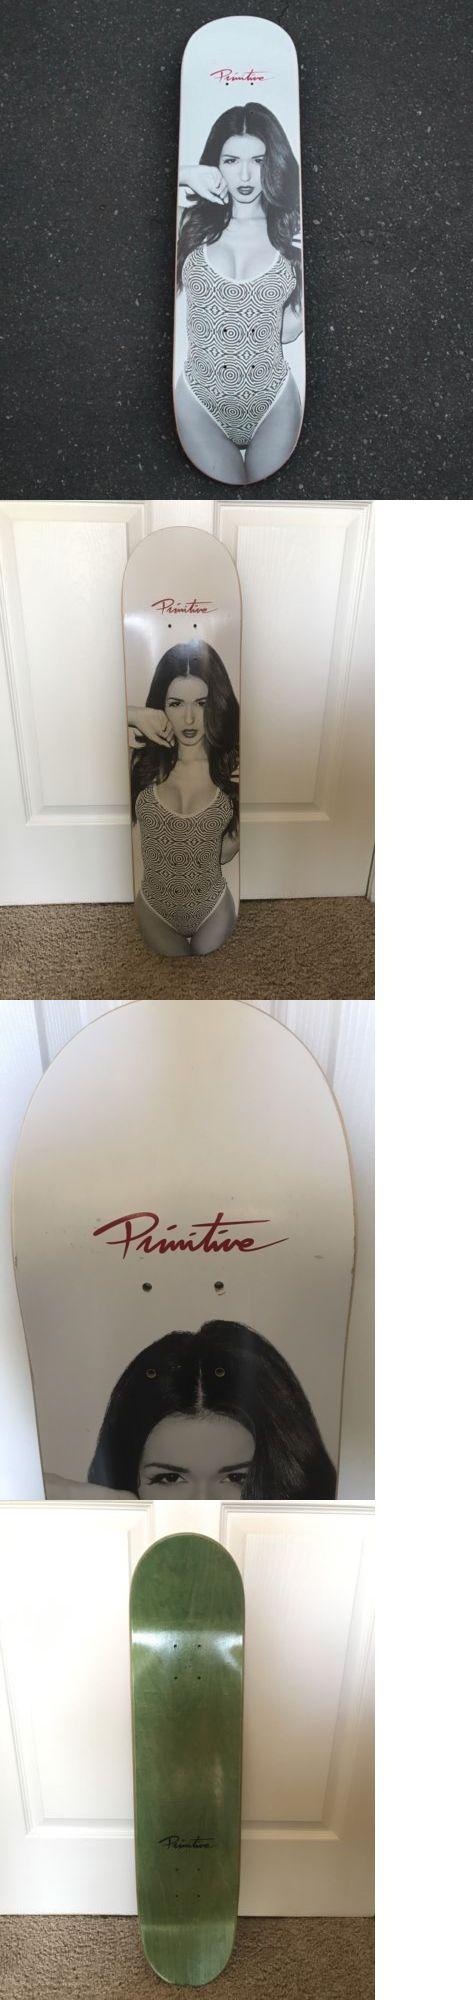 Decks 16263: Rare Primitive X Ashley Sky Skateboard Deck Sale!!! -> BUY IT NOW ONLY: $79.99 on eBay!